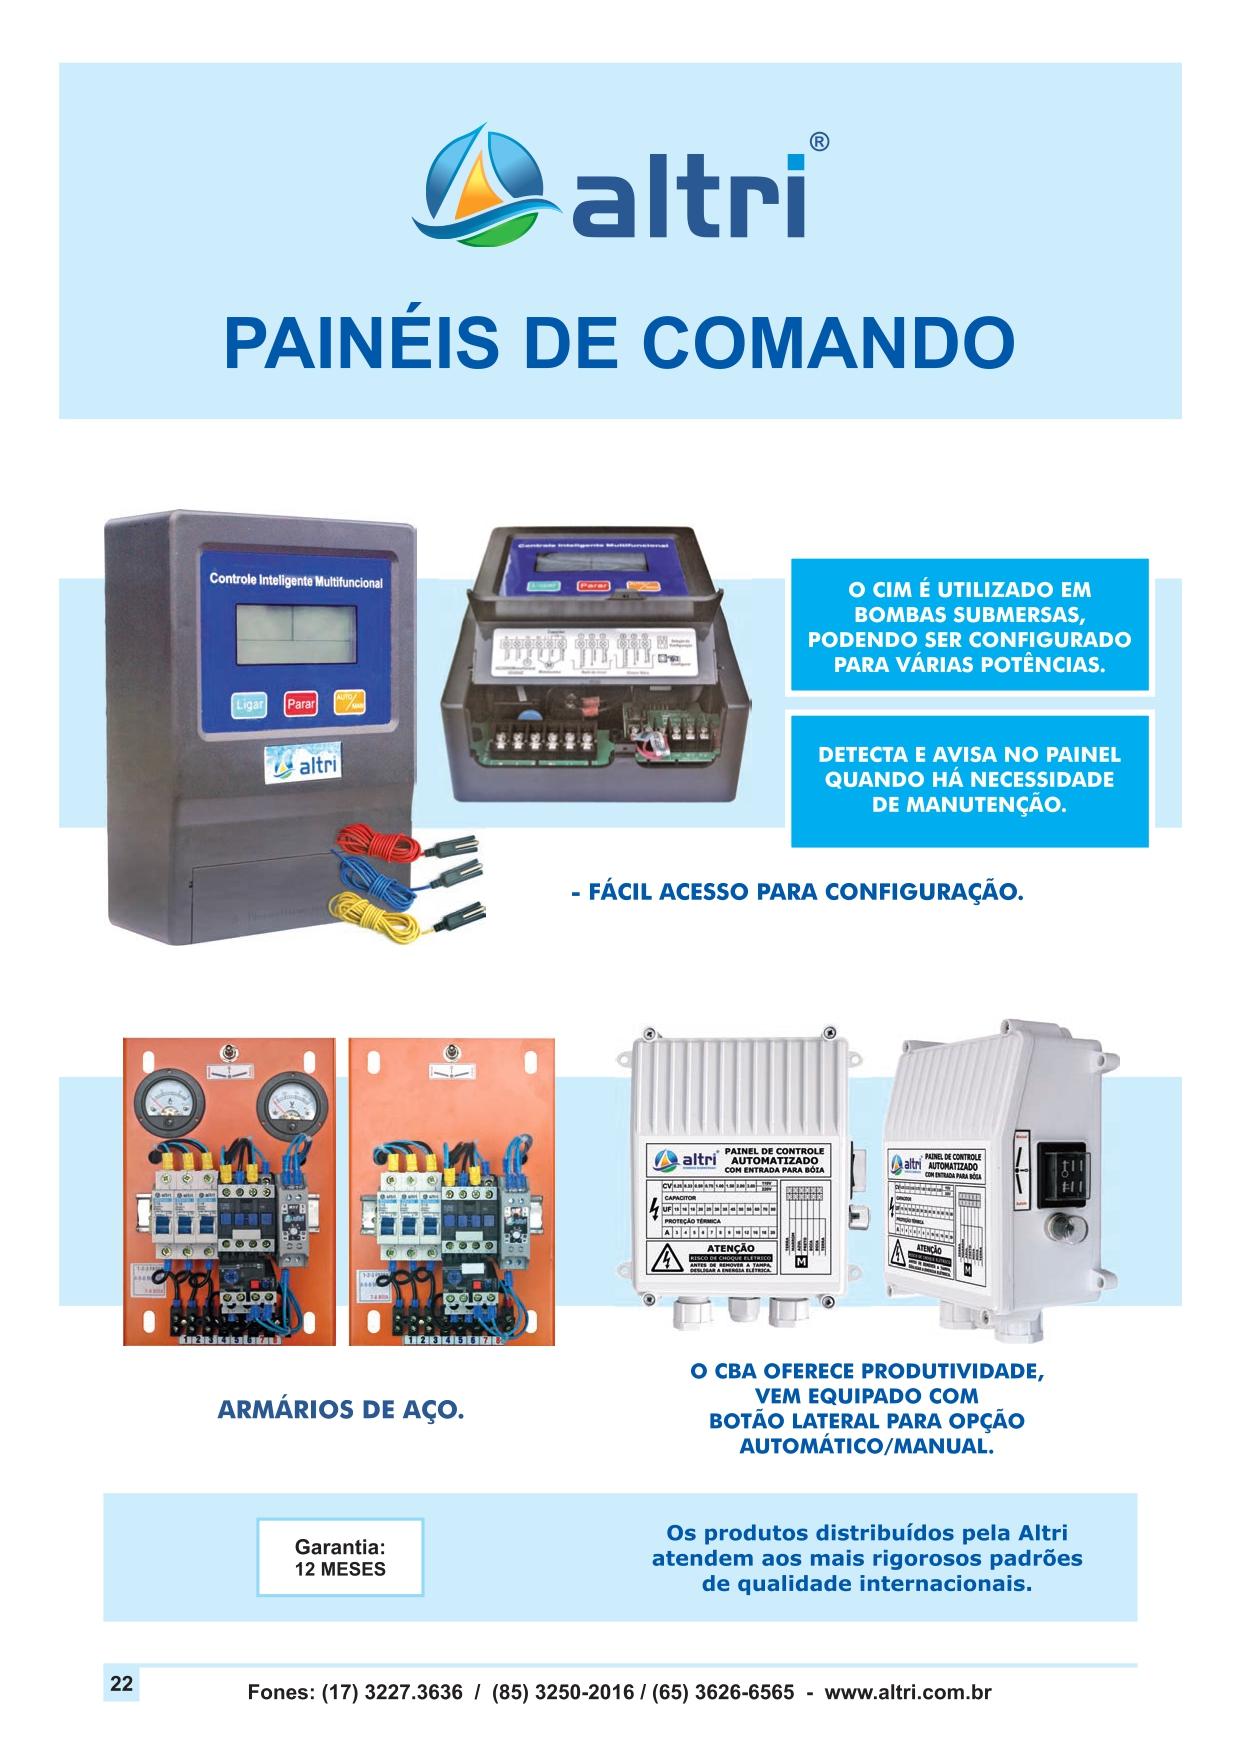 CATALOGO DE PRODUTOS ALTRI 2021 - WEB_page-0024